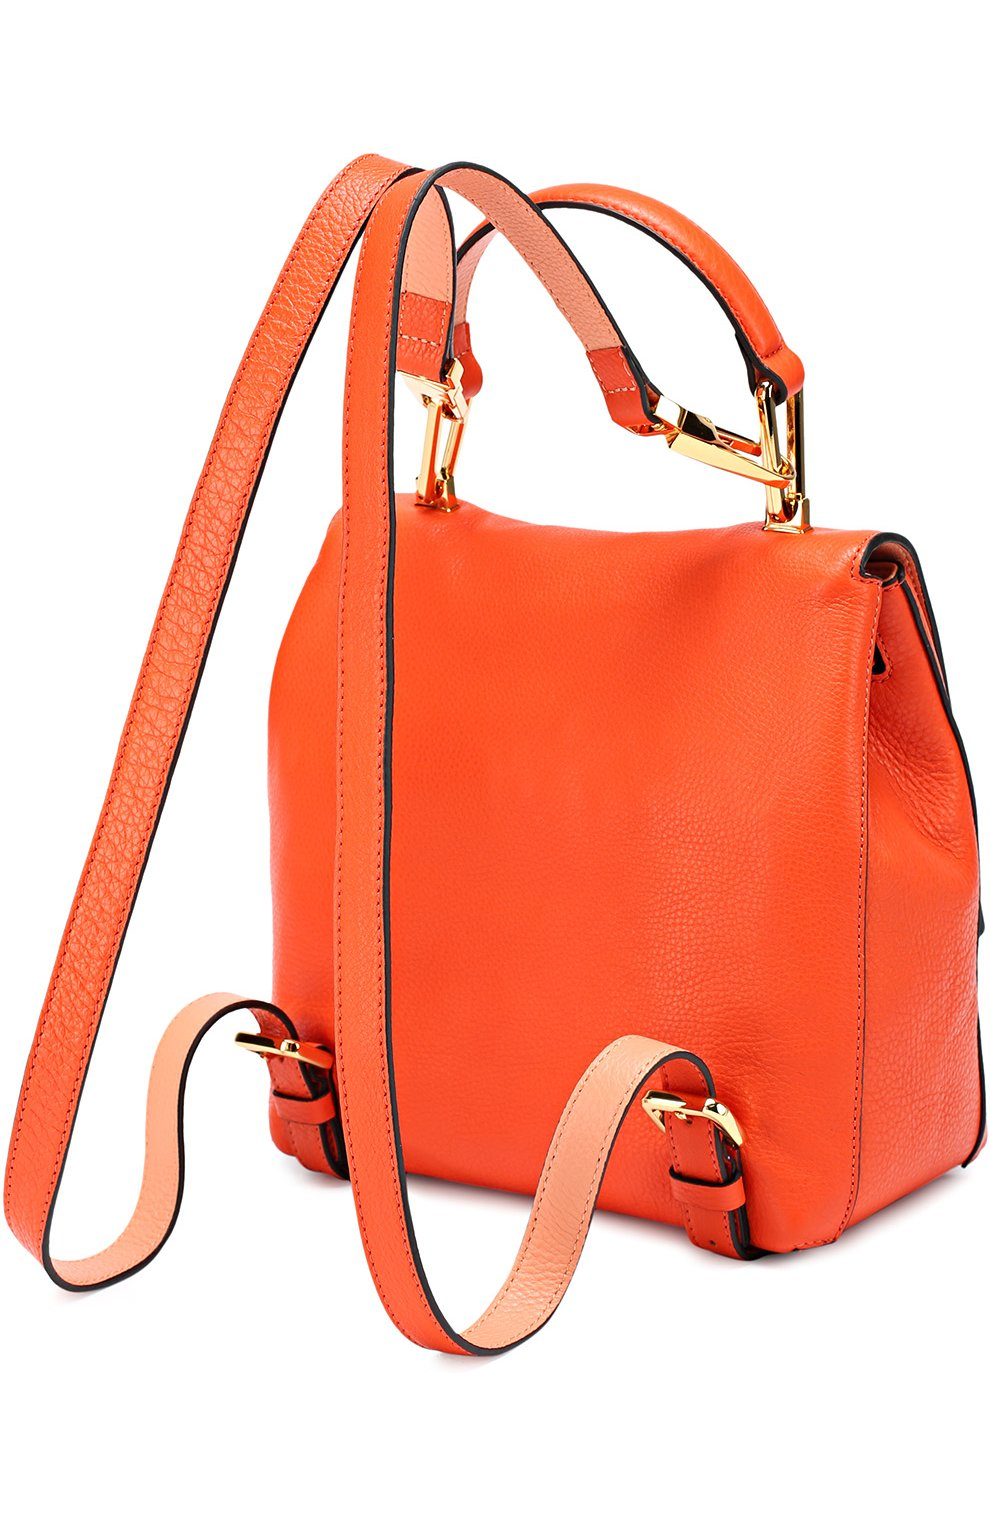 Кожаный рюкзак Liya | Фото №3